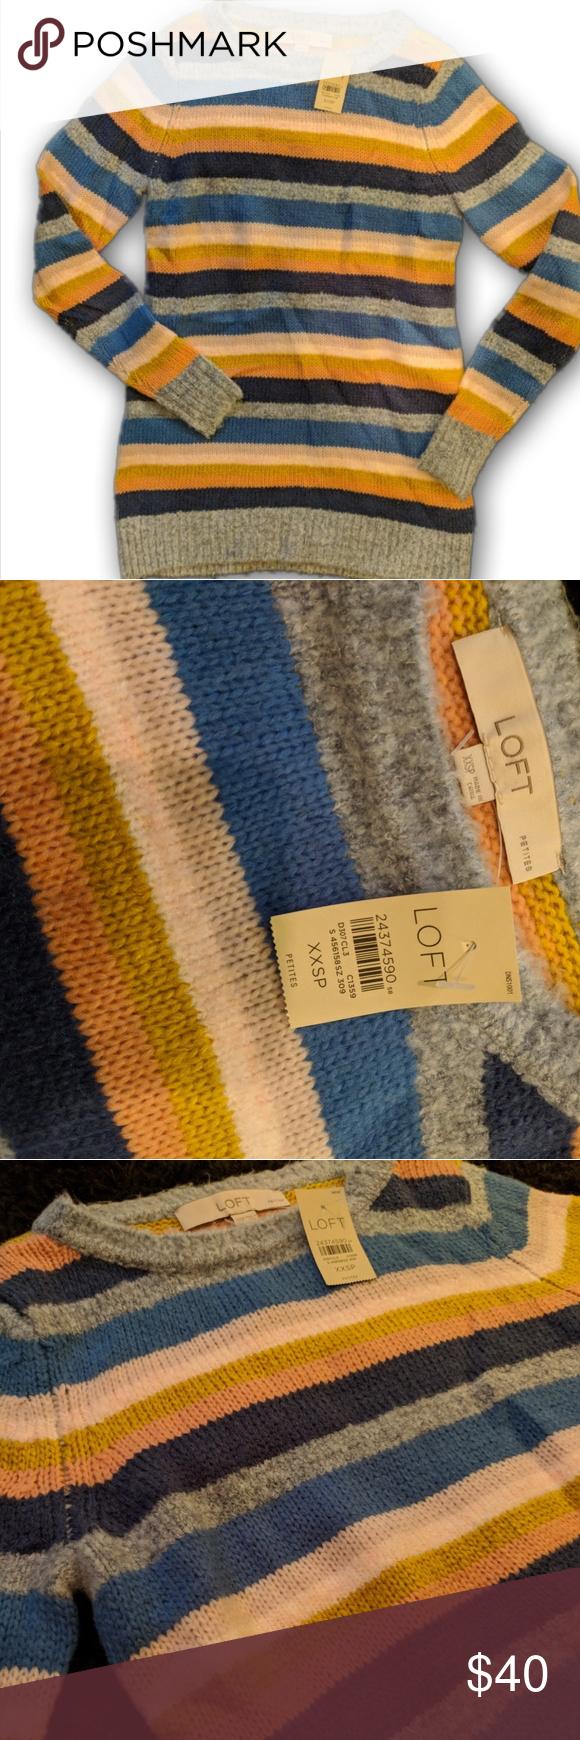 NWT LOFT Striped Sweater XXSP 🆕** I consider all offers